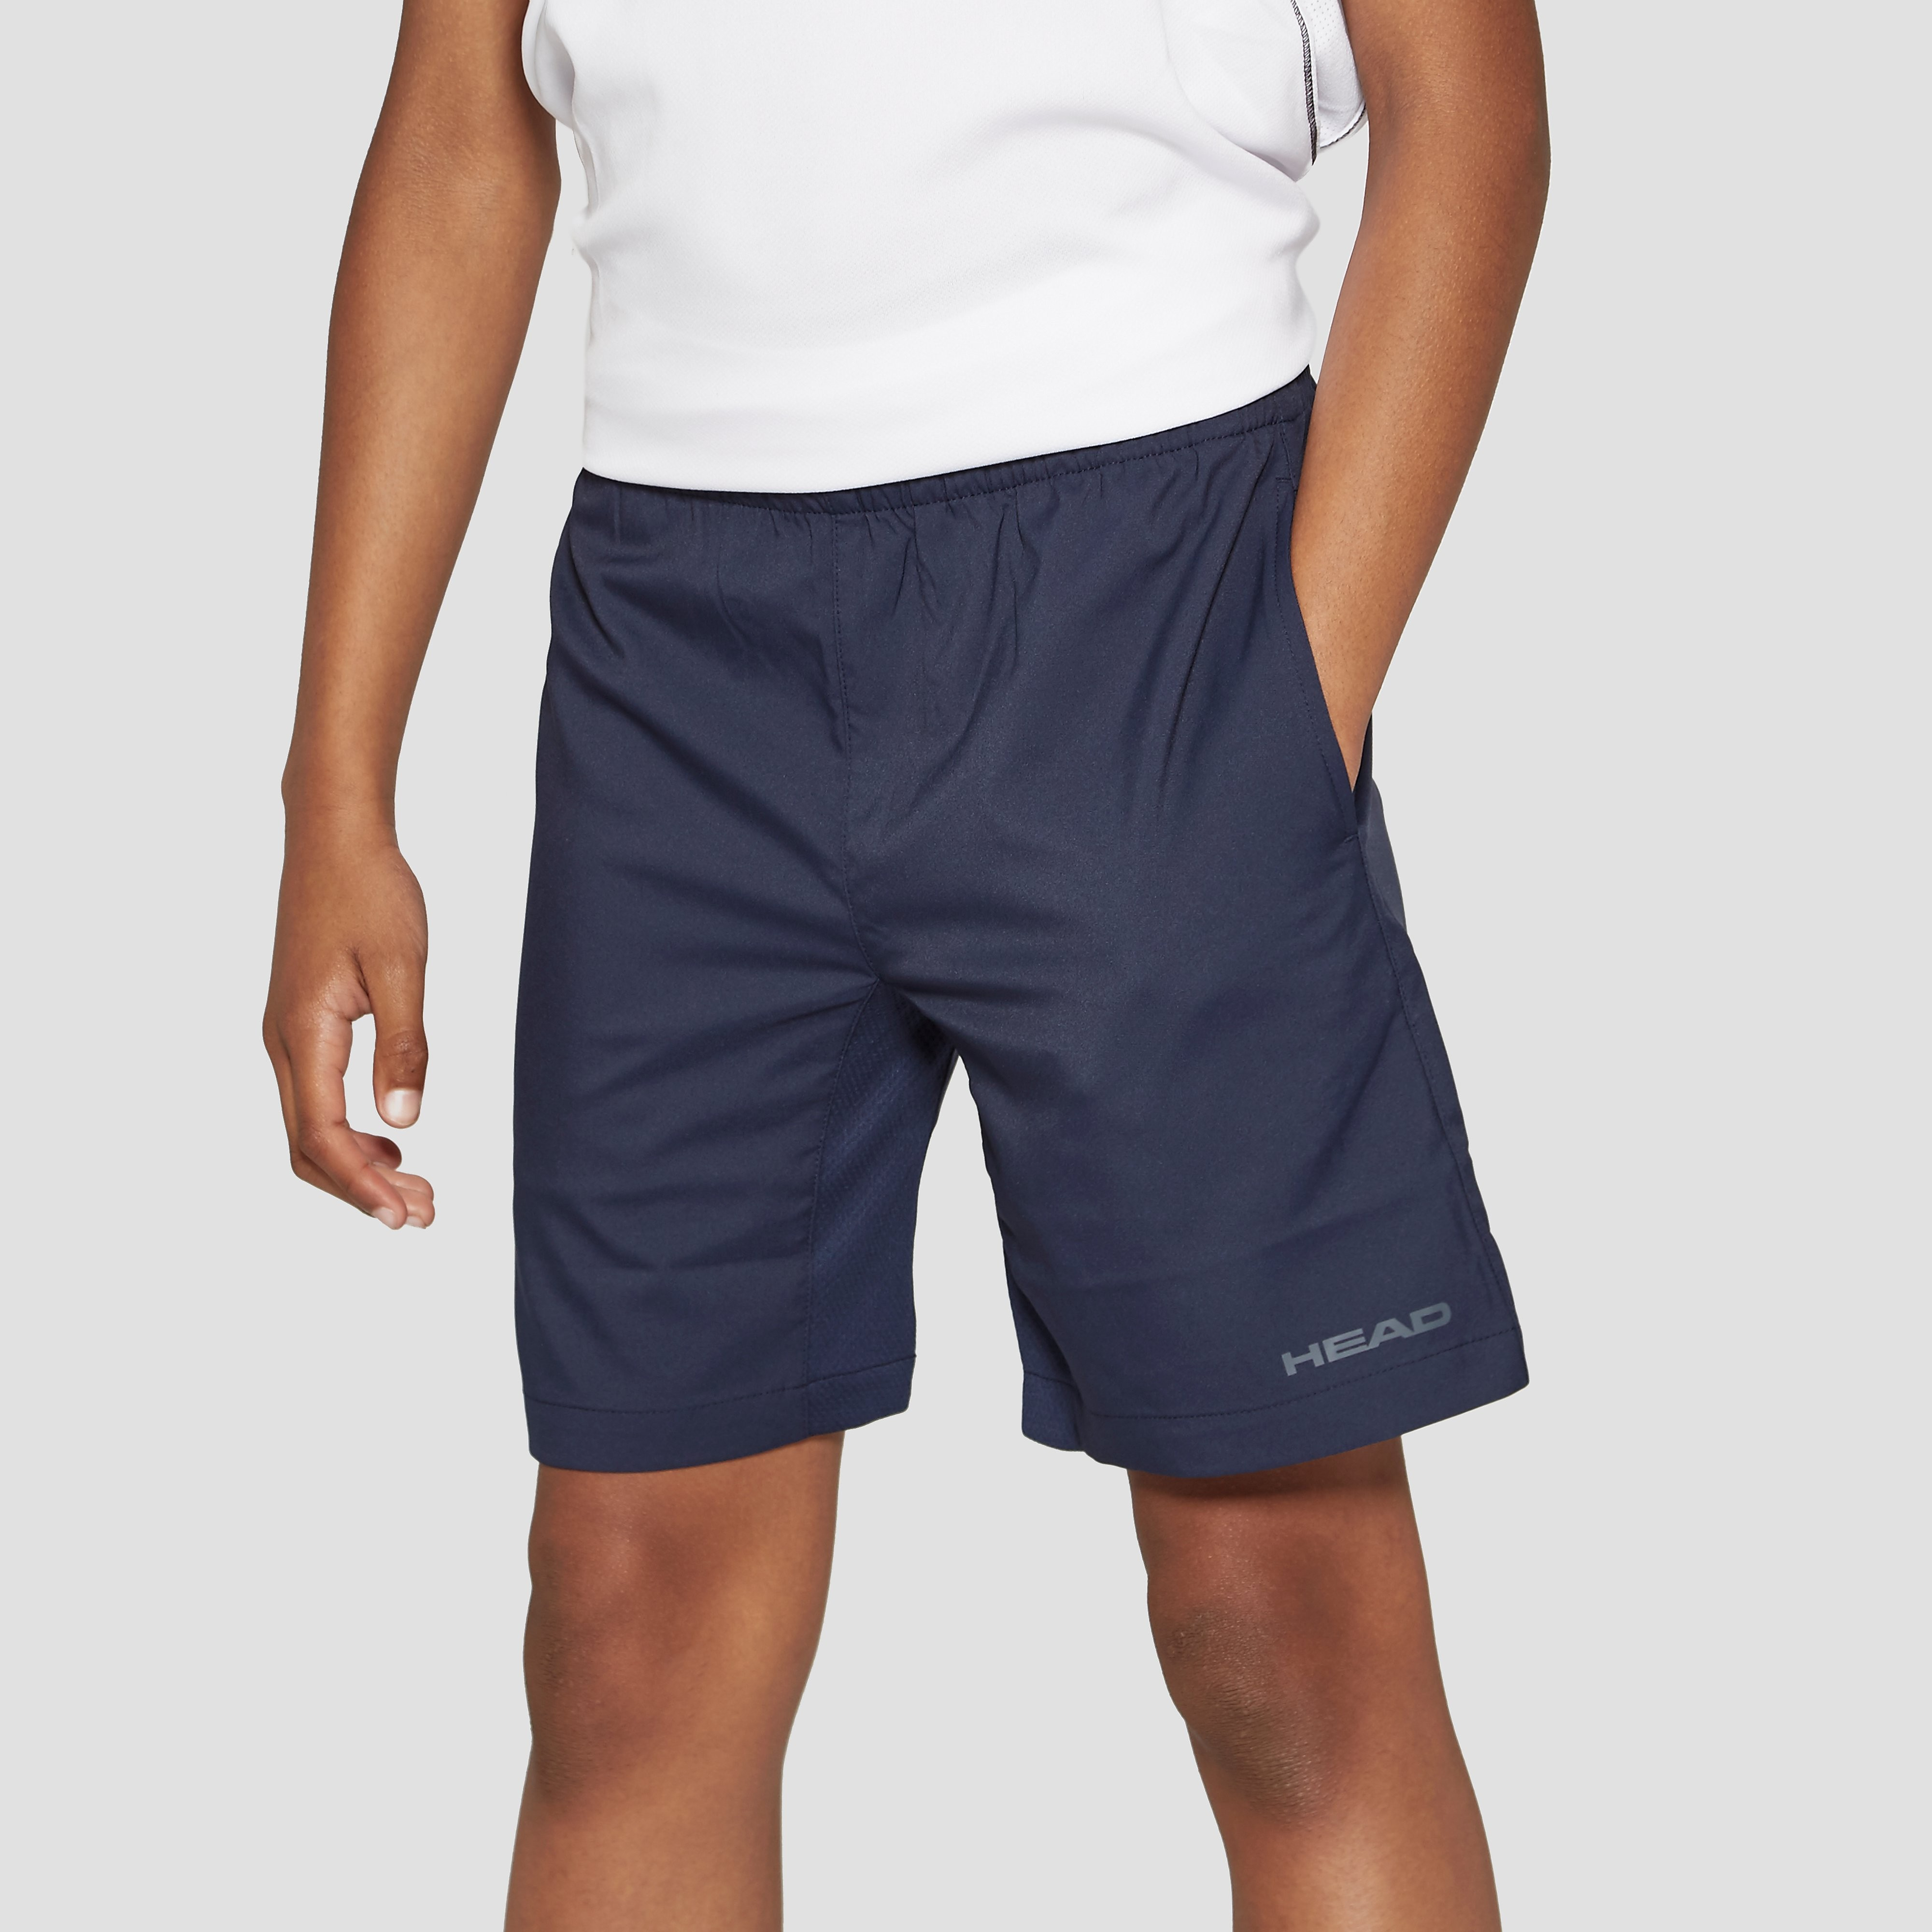 Head Club Bermuda Junior Tennis Shorts